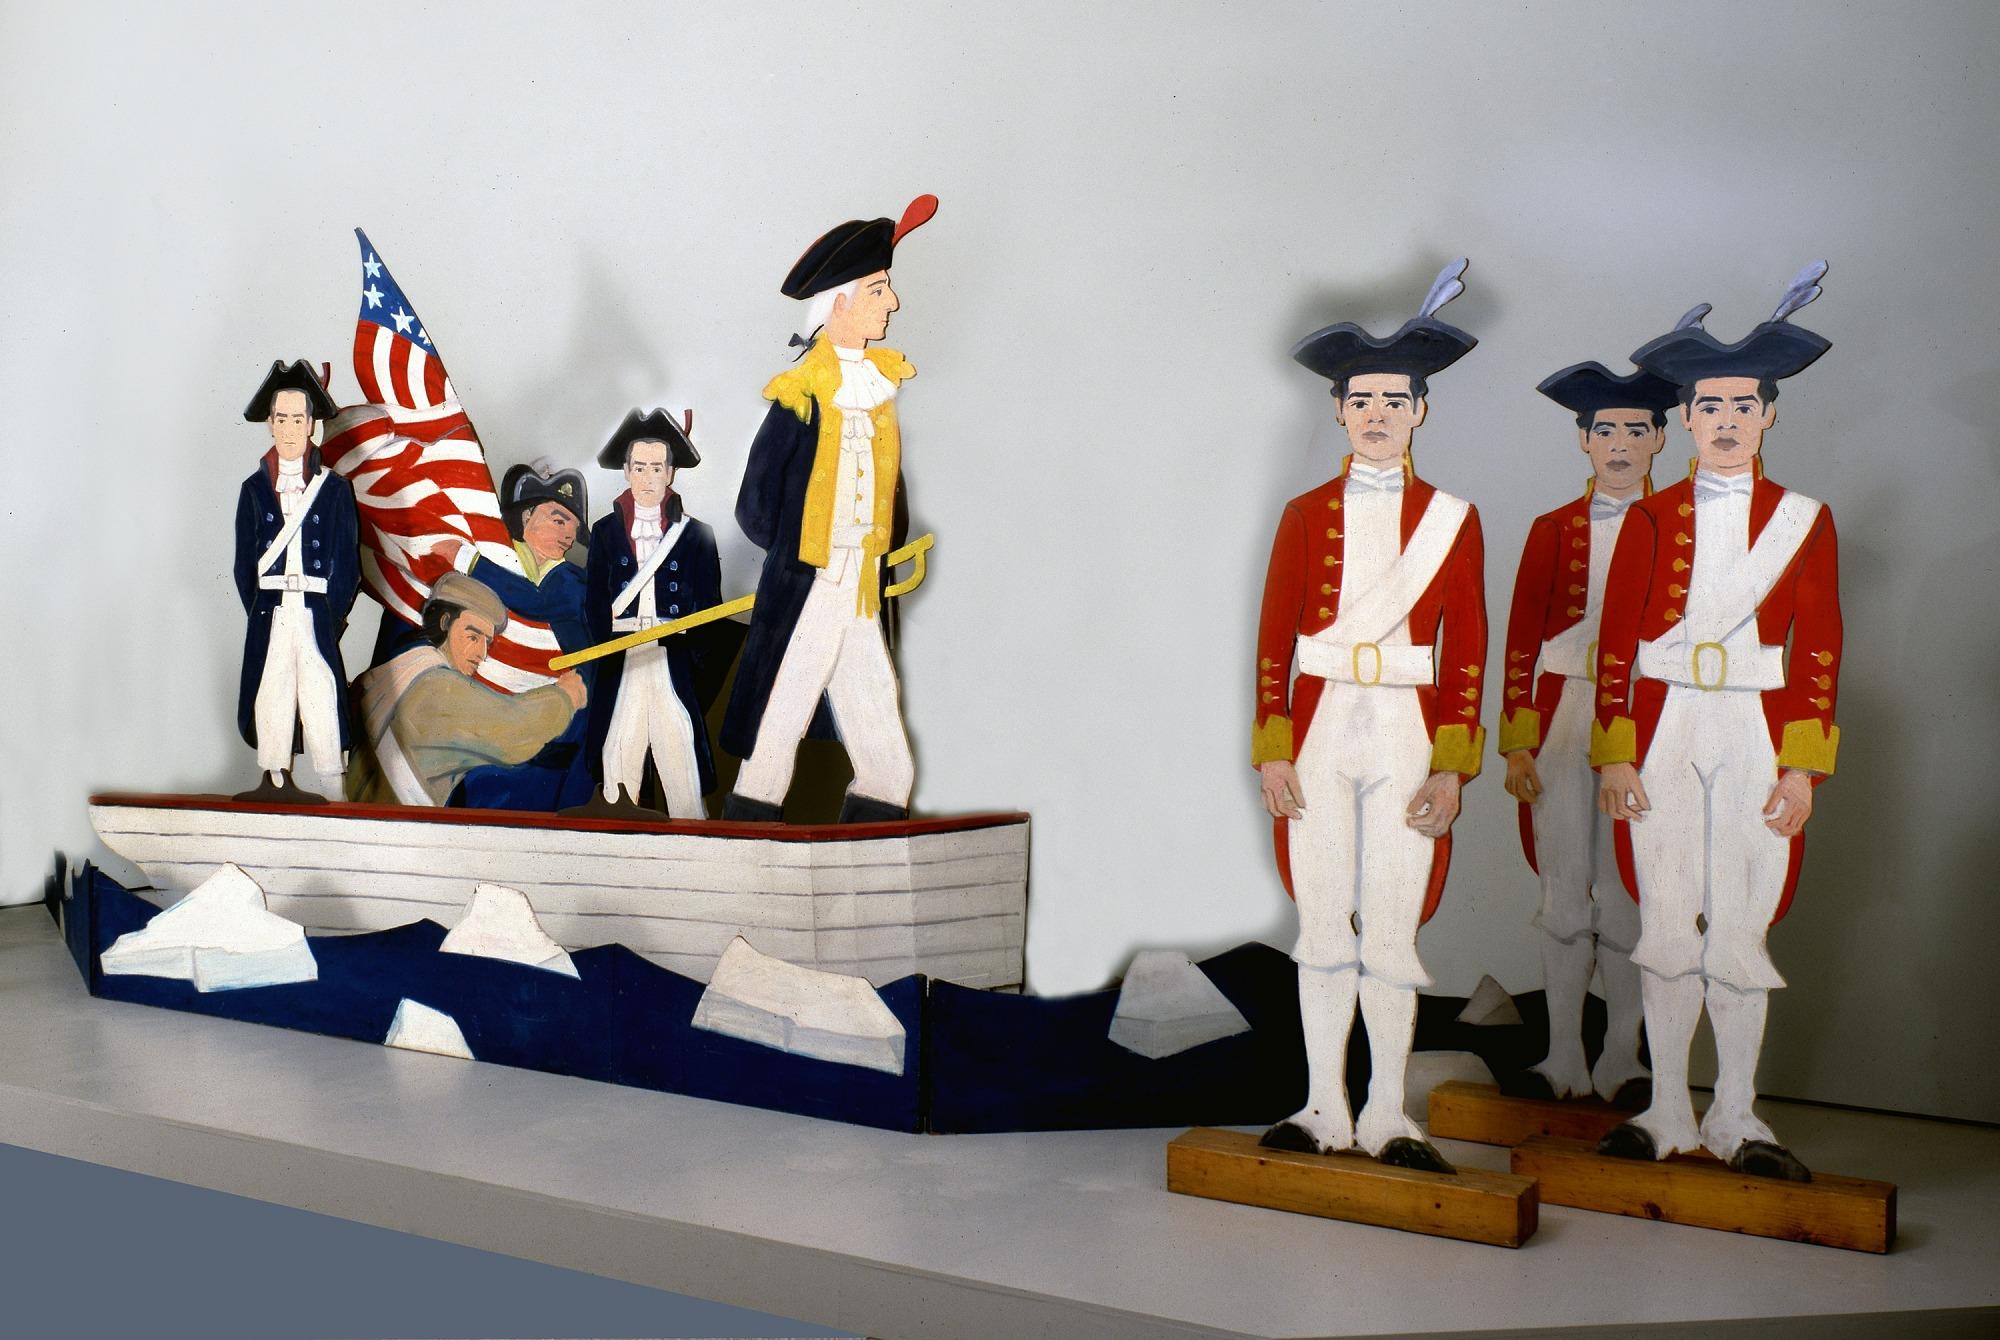 Washington Crossing the Delaware: American Revolutionary Soldier